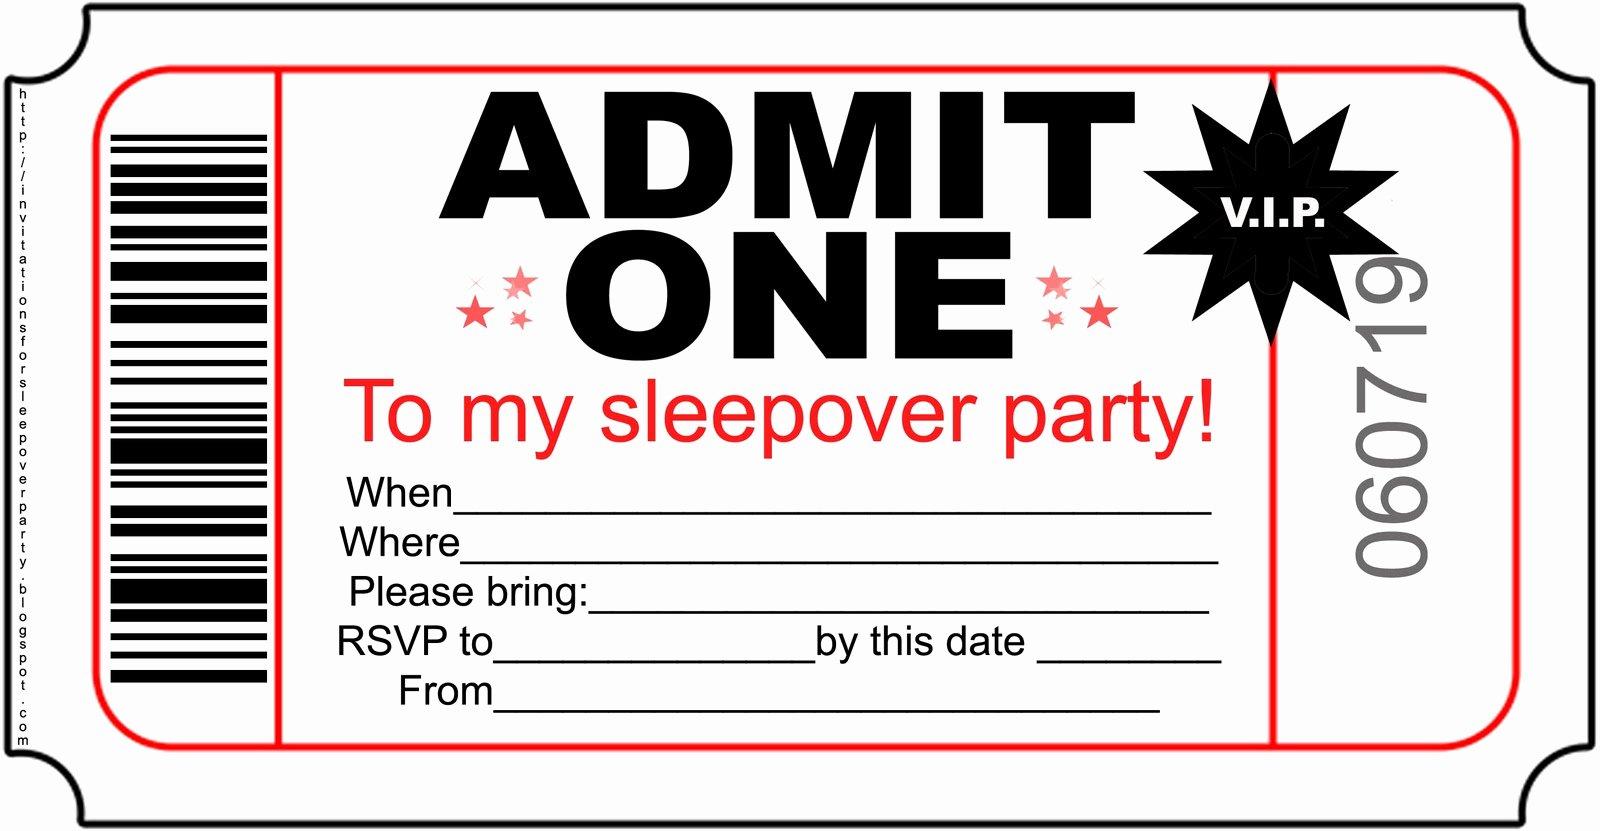 Movie Ticket Invitation Template New Template Inspiration Movie Ticket Invitation Template